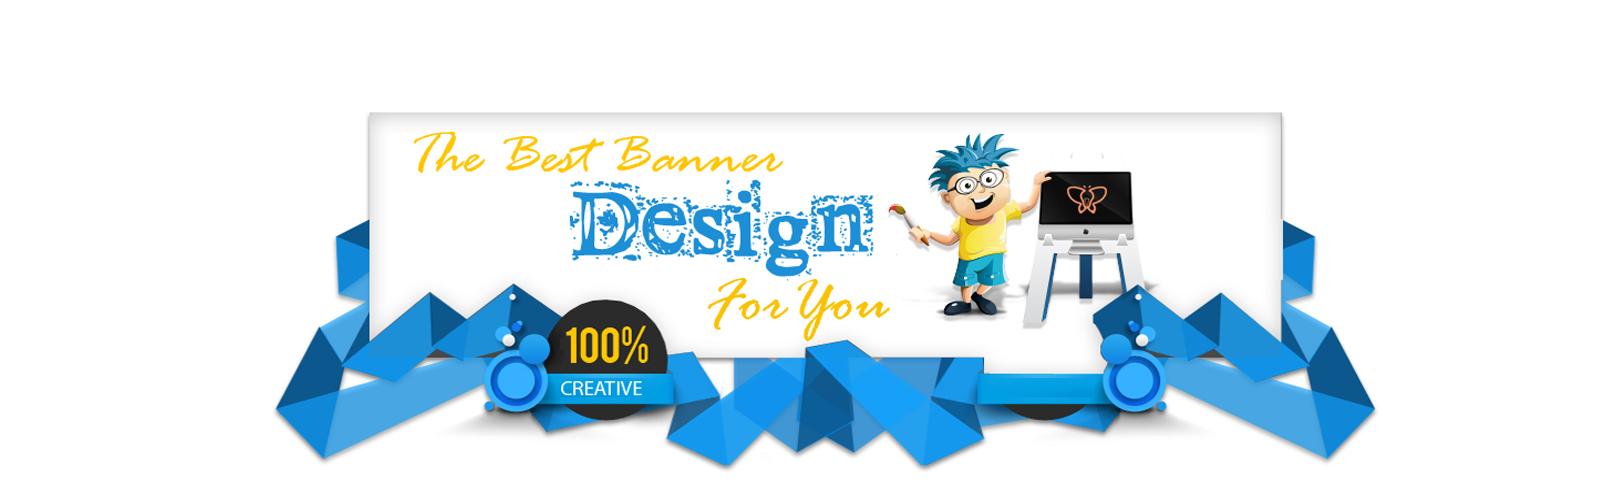 Banner design for e commerce - 3fcc5c33fa1560ca3ef1c3db7d131fab Png